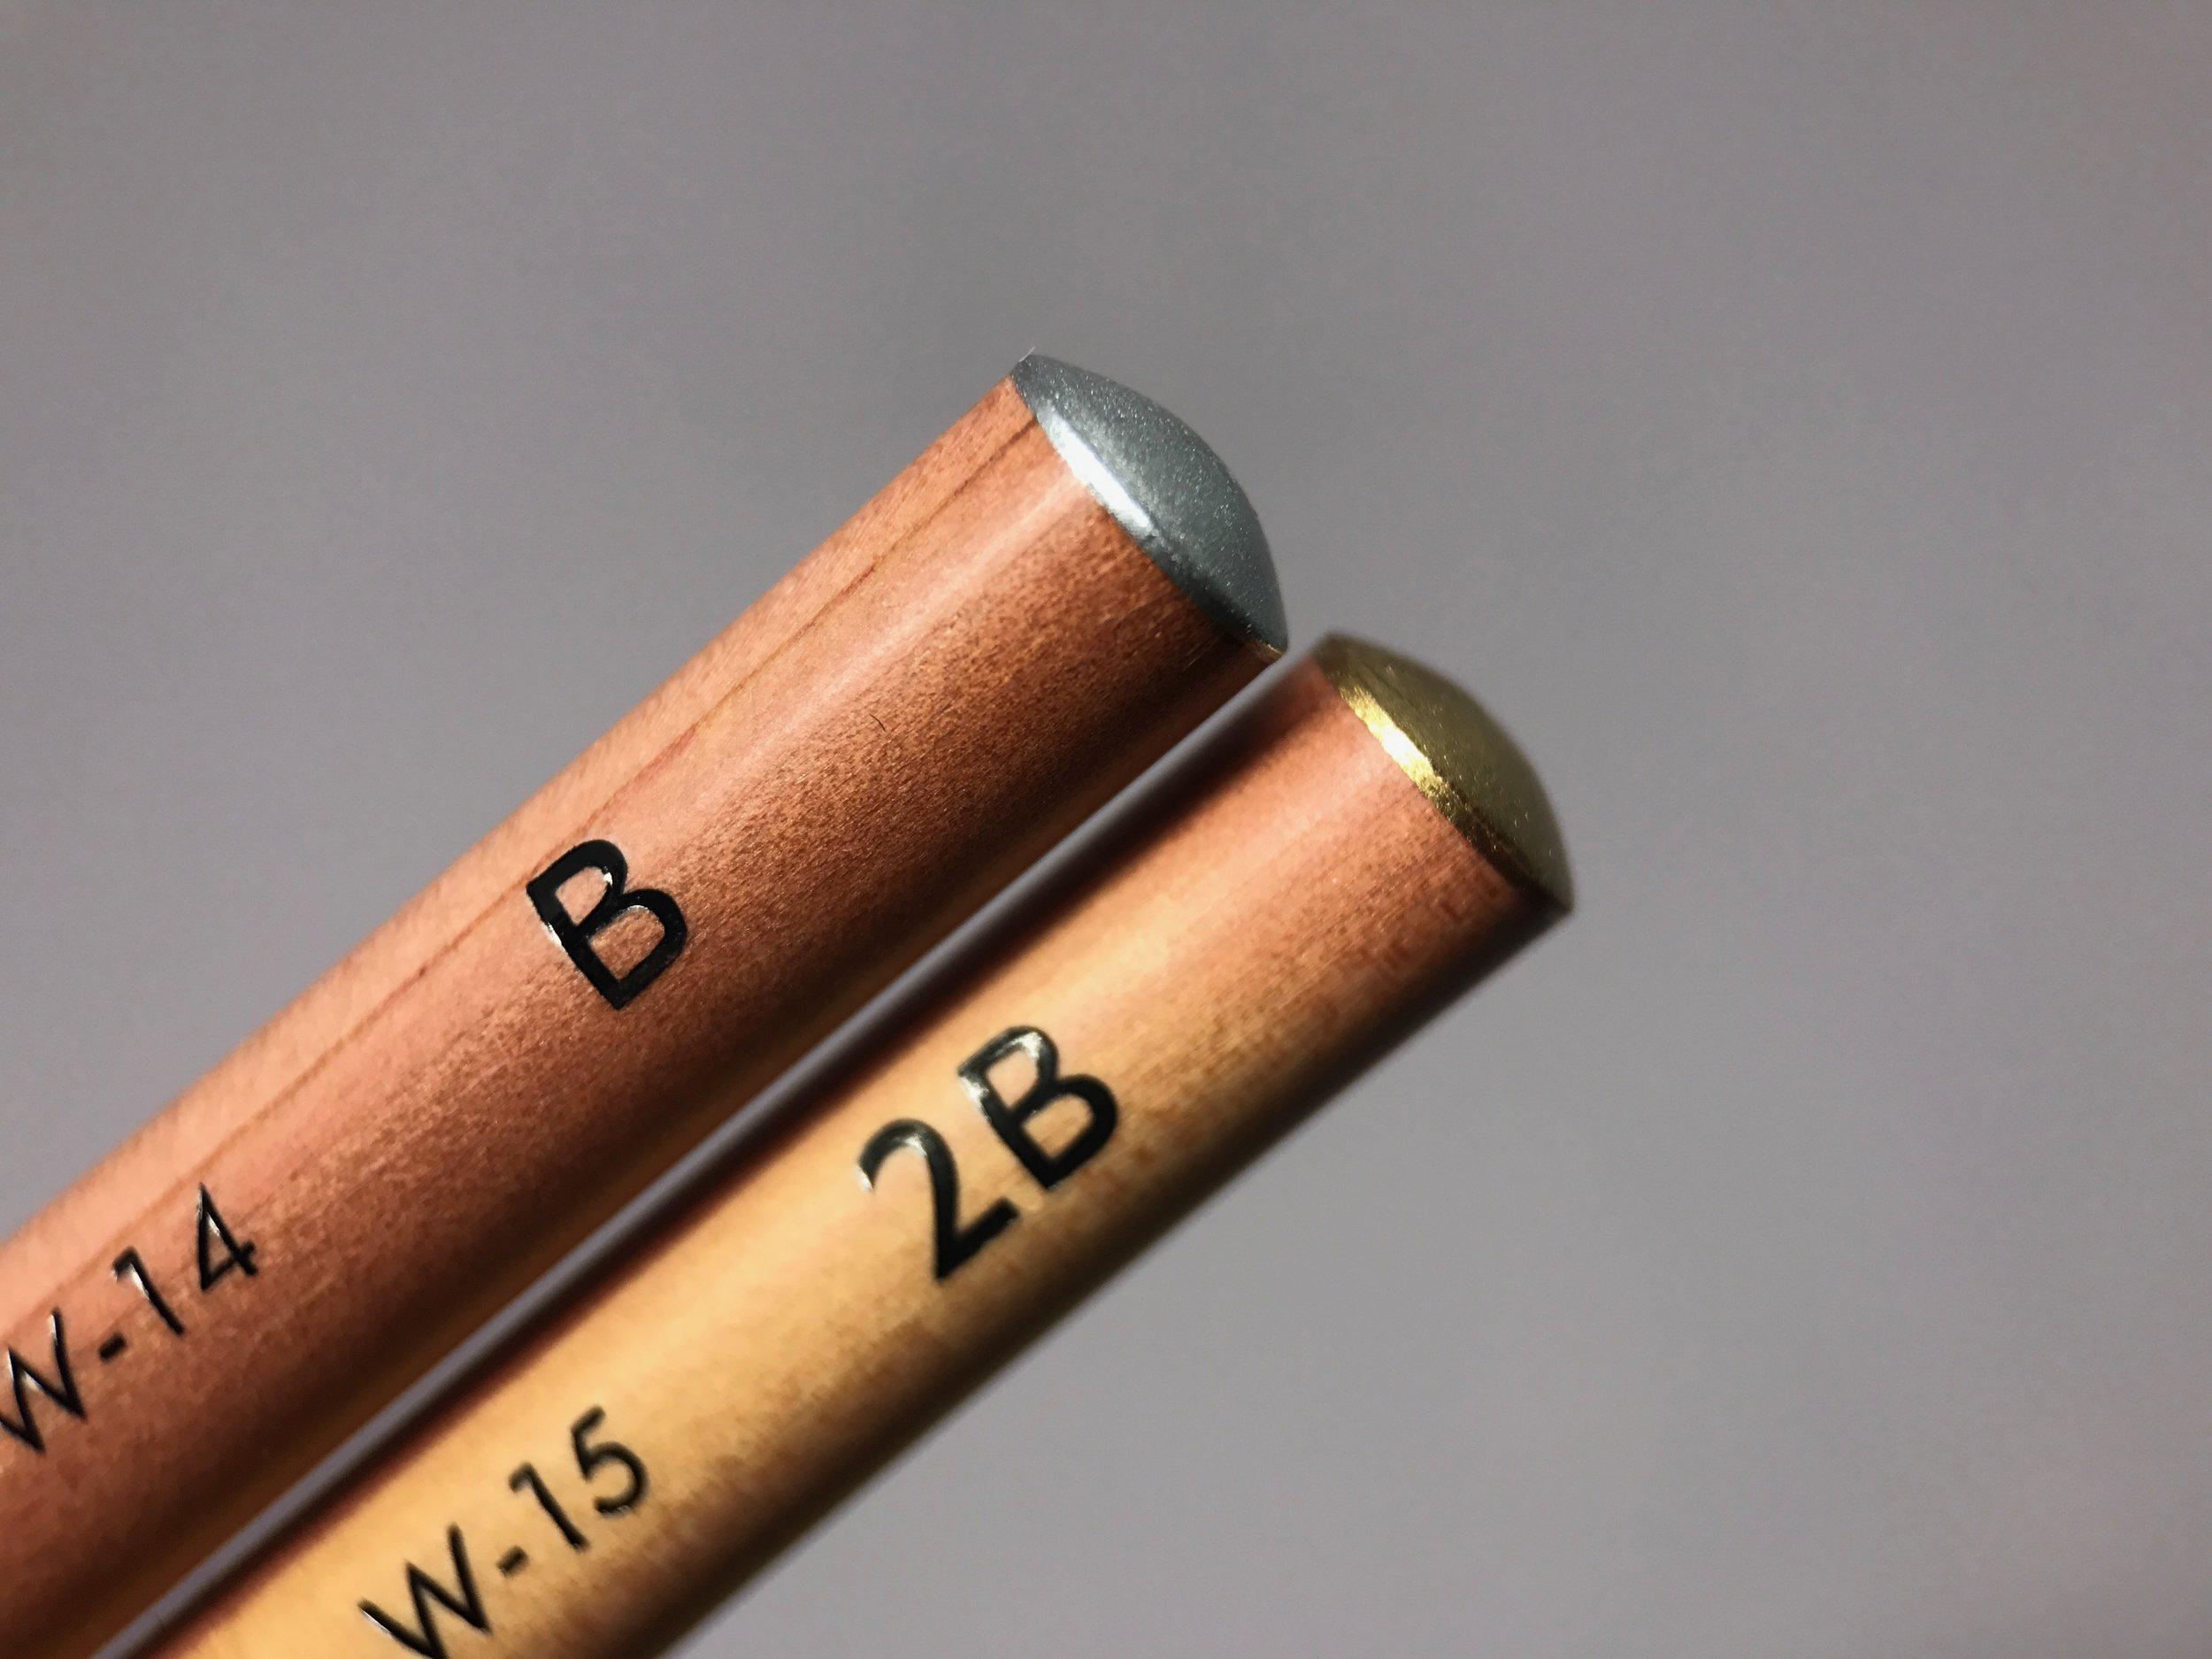 kirin-woody-pal-eddy-pencil-3.jpg